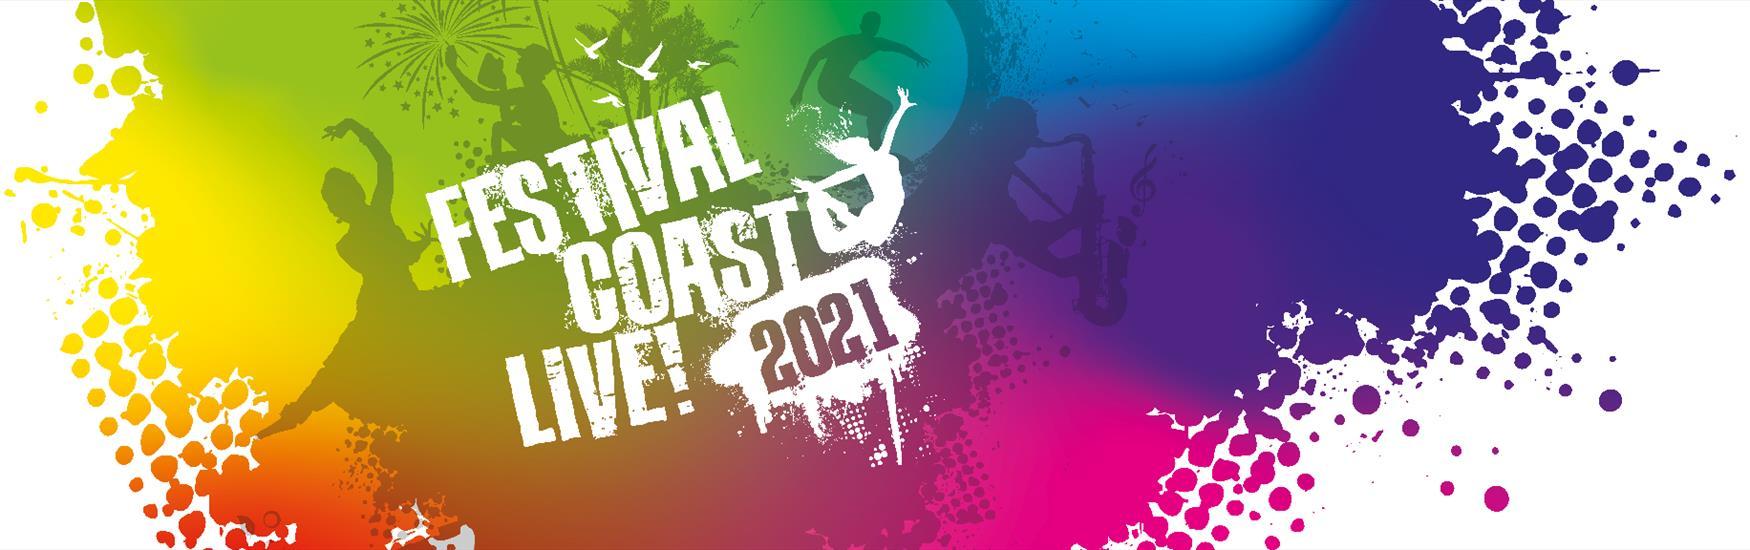 Festival Coast Live 2021 Website Banner